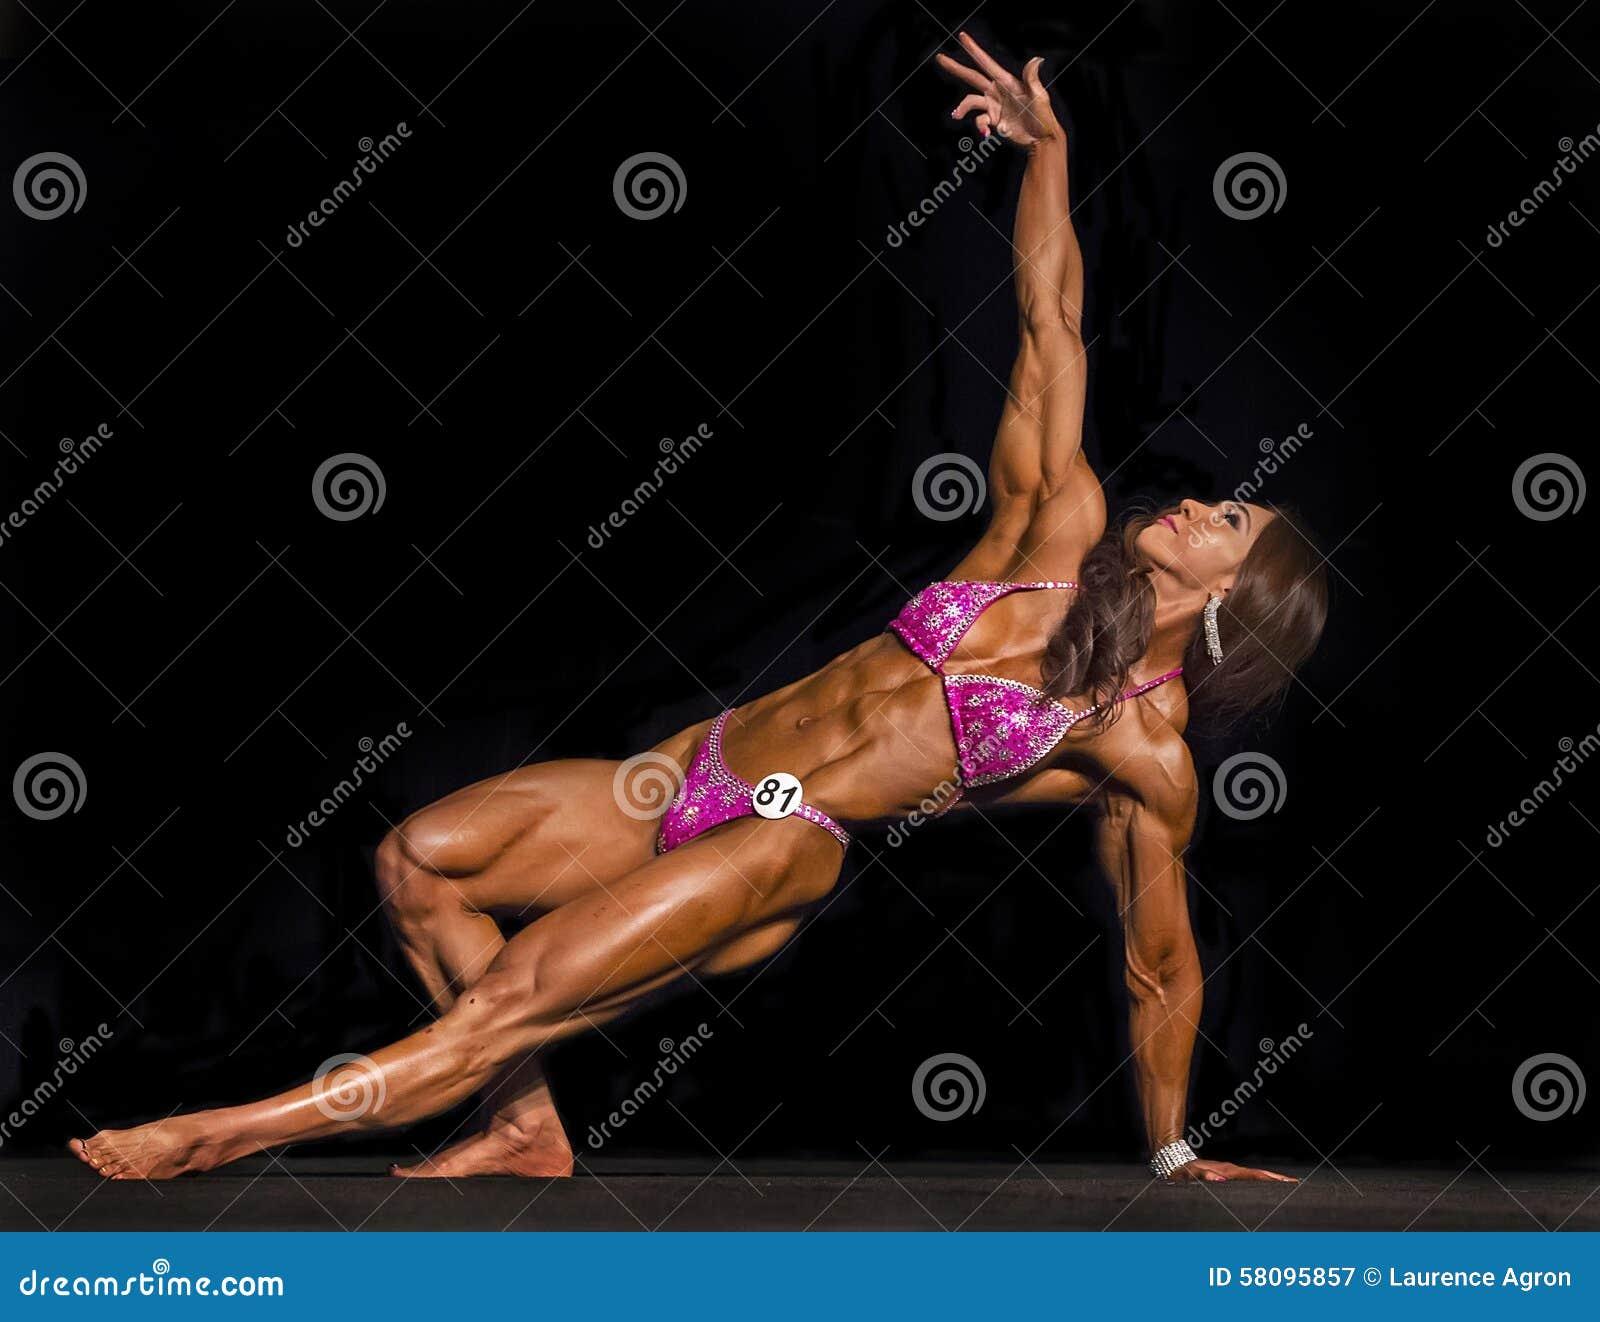 Nude asian girl in platform thongs